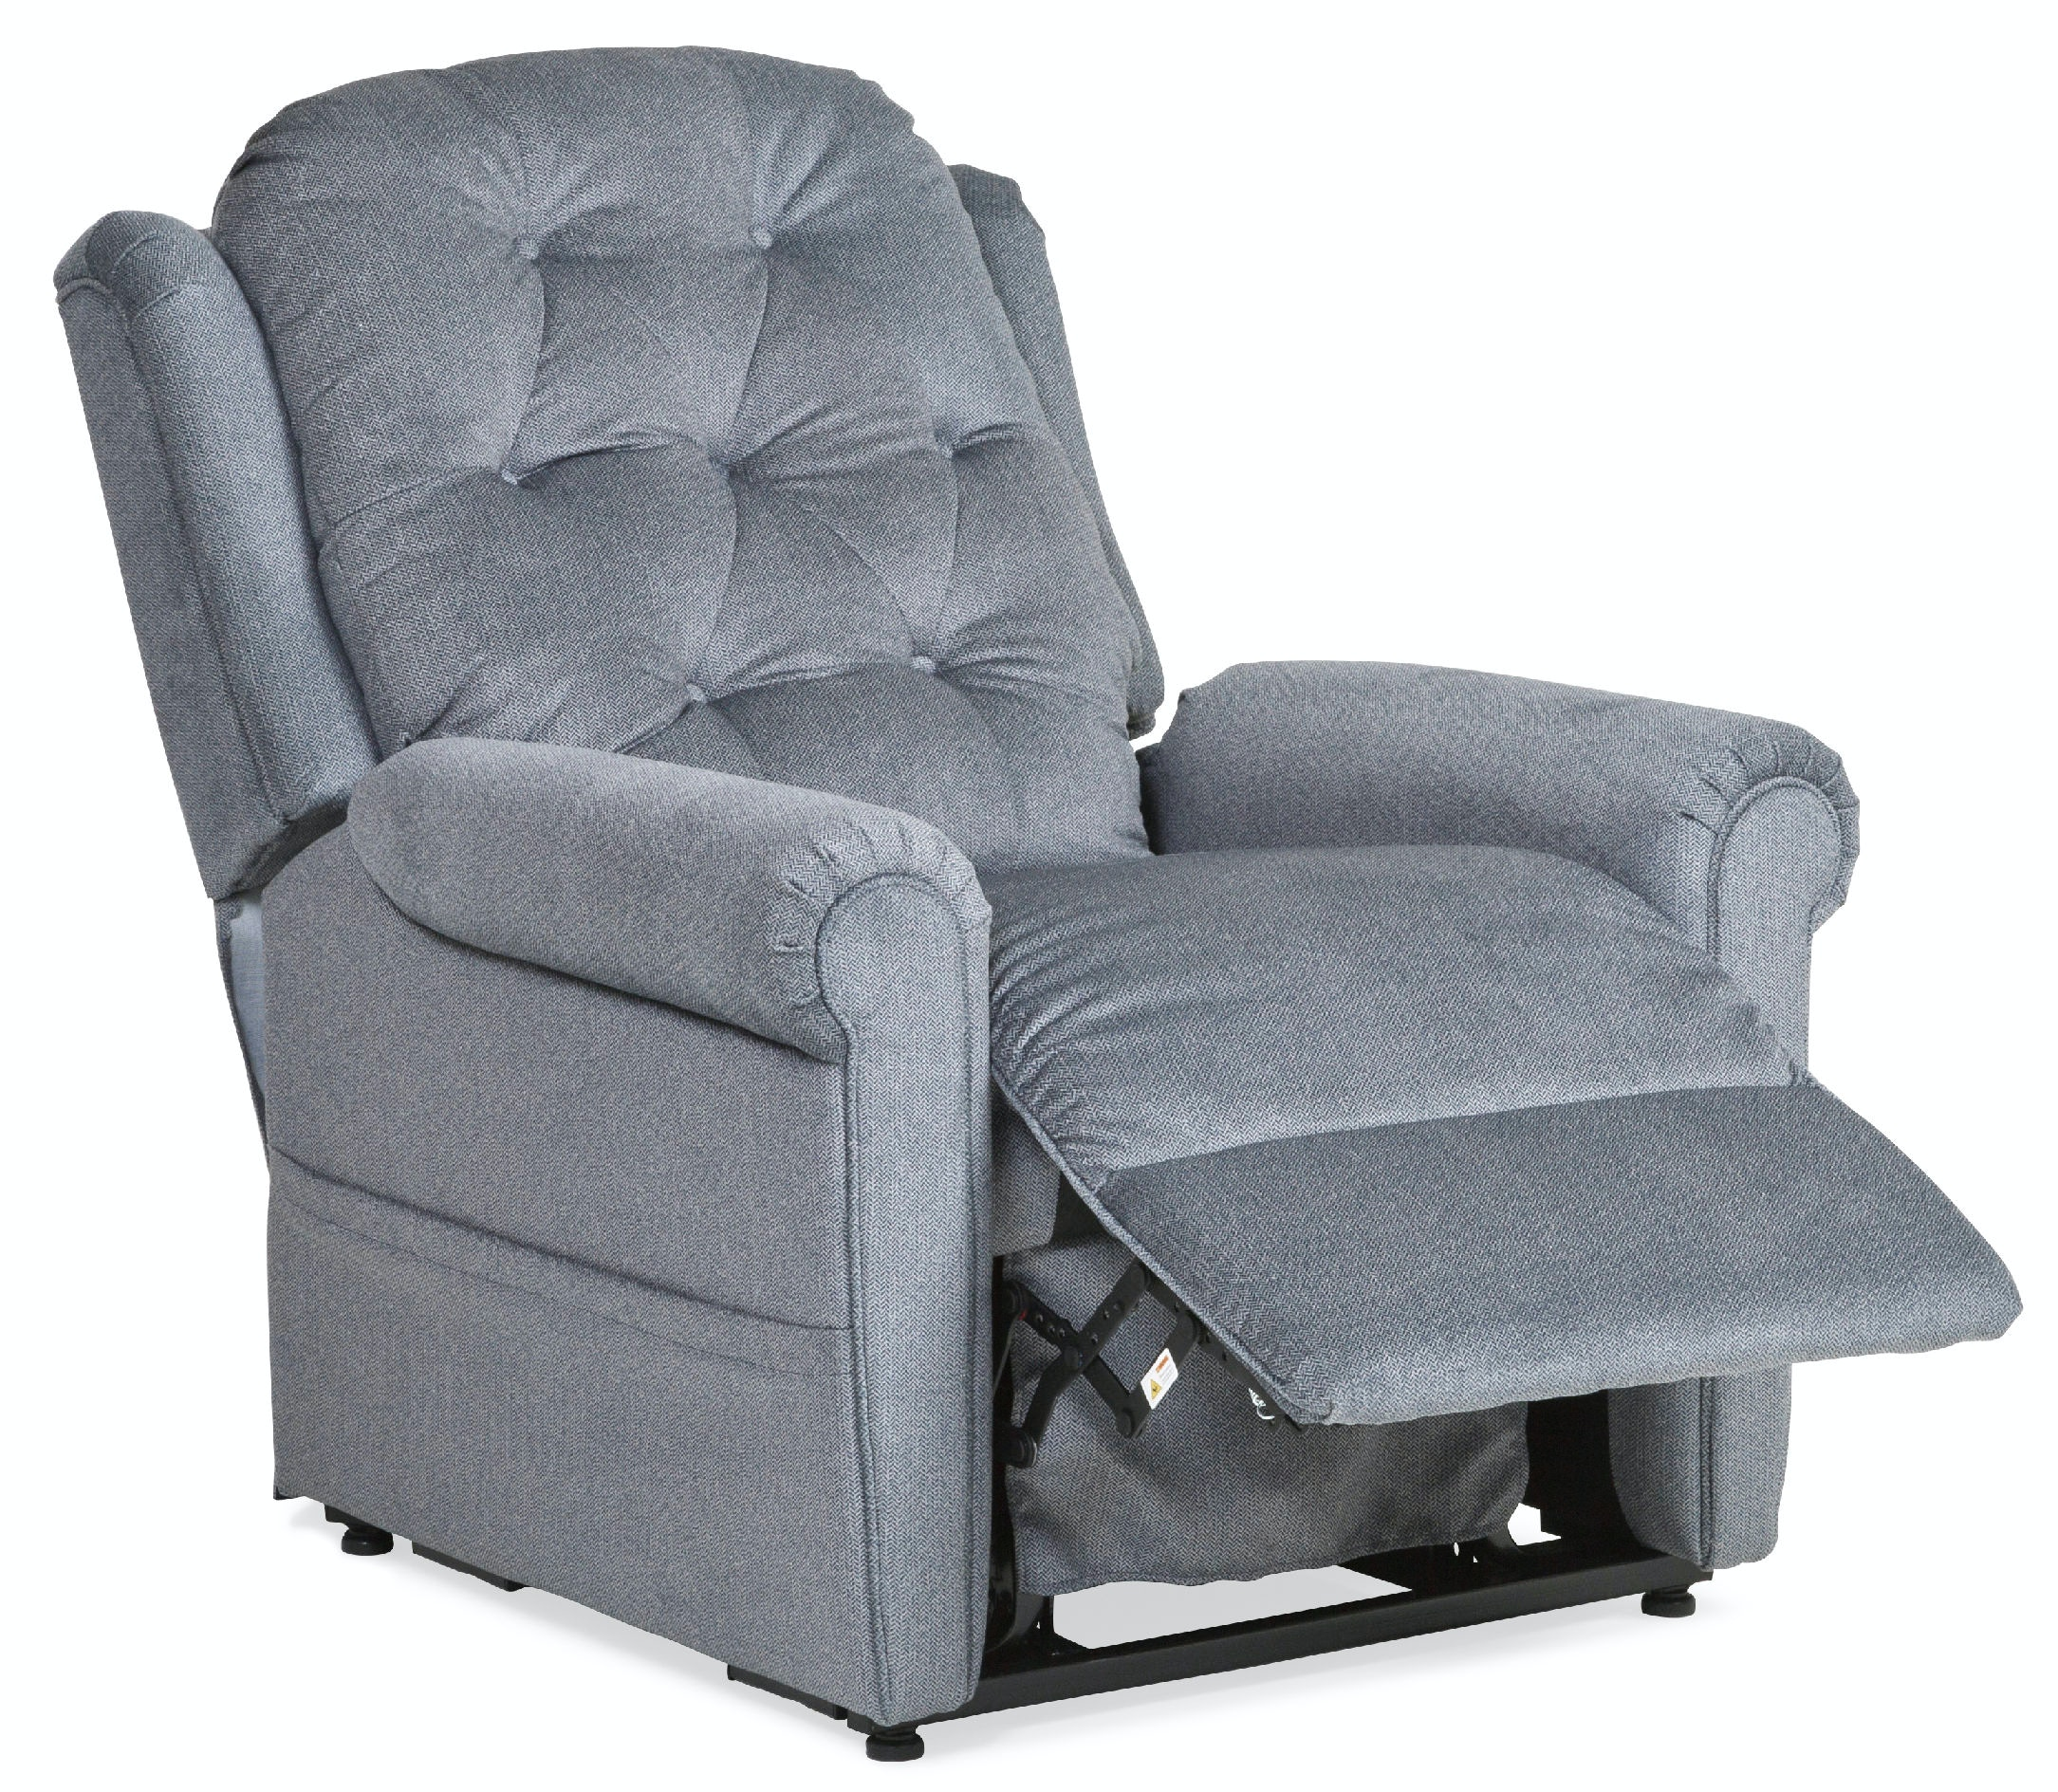 Dora Power Motion Lift Chair Recliner ST460728  sc 1 st  Star Furniture & Living Room Dora Power Motion Lift Chair Recliner islam-shia.org